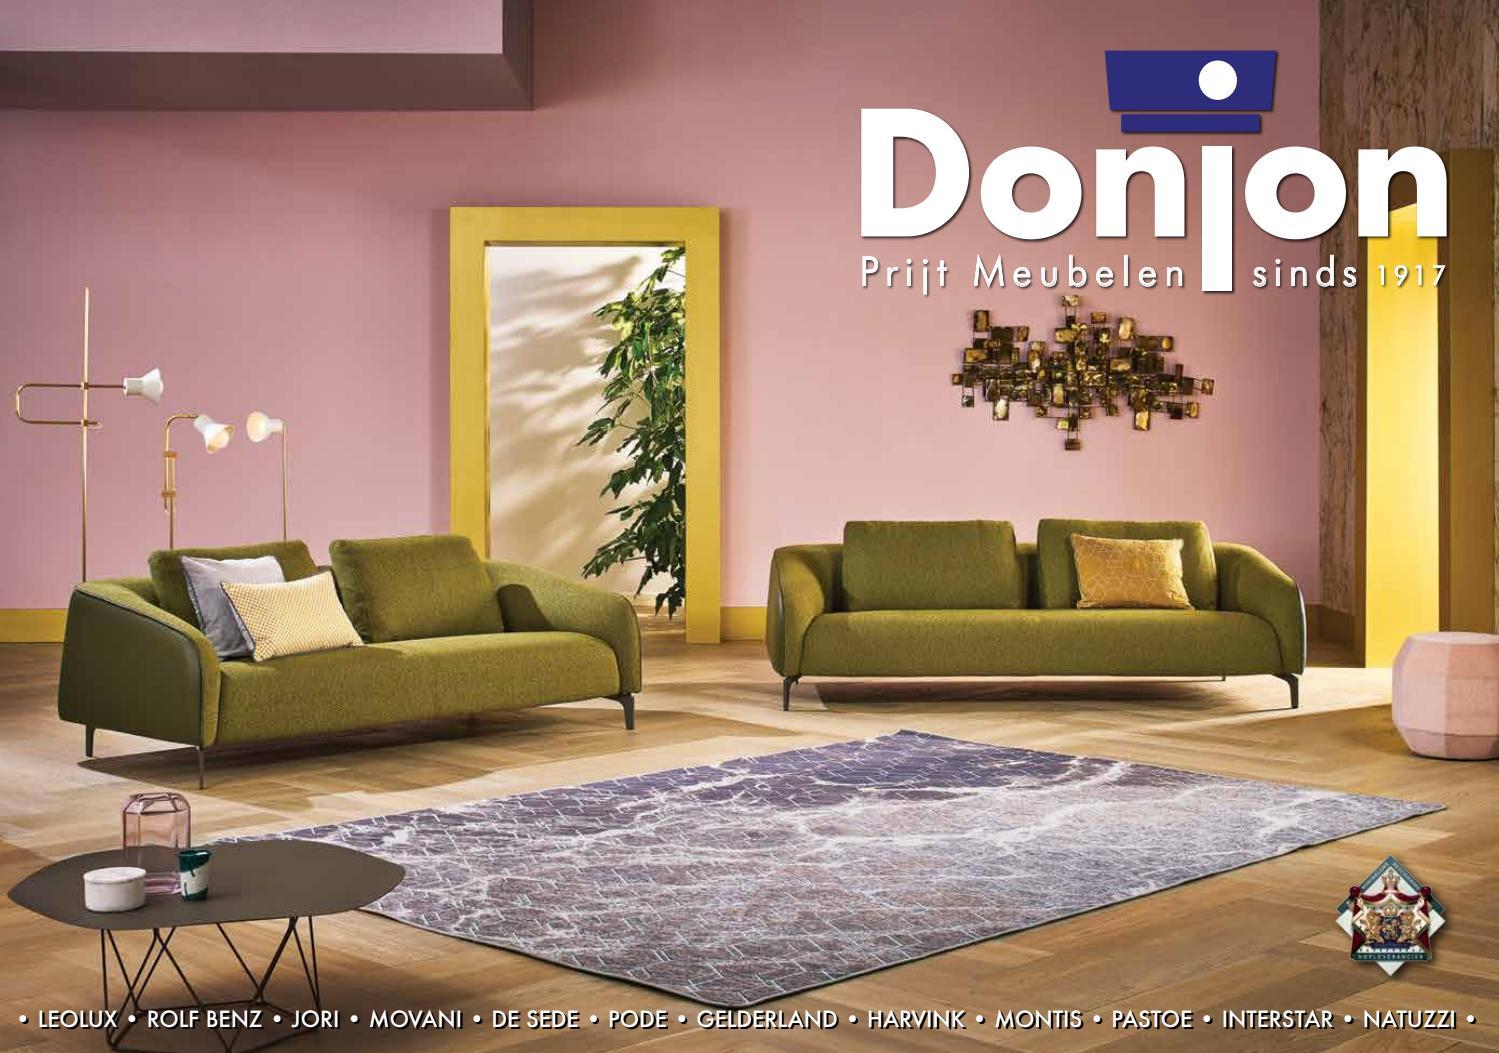 4x Favoriete Eetkamertafel : Donjon meubelen collectieboek 2018 2019 by de donjon issuu